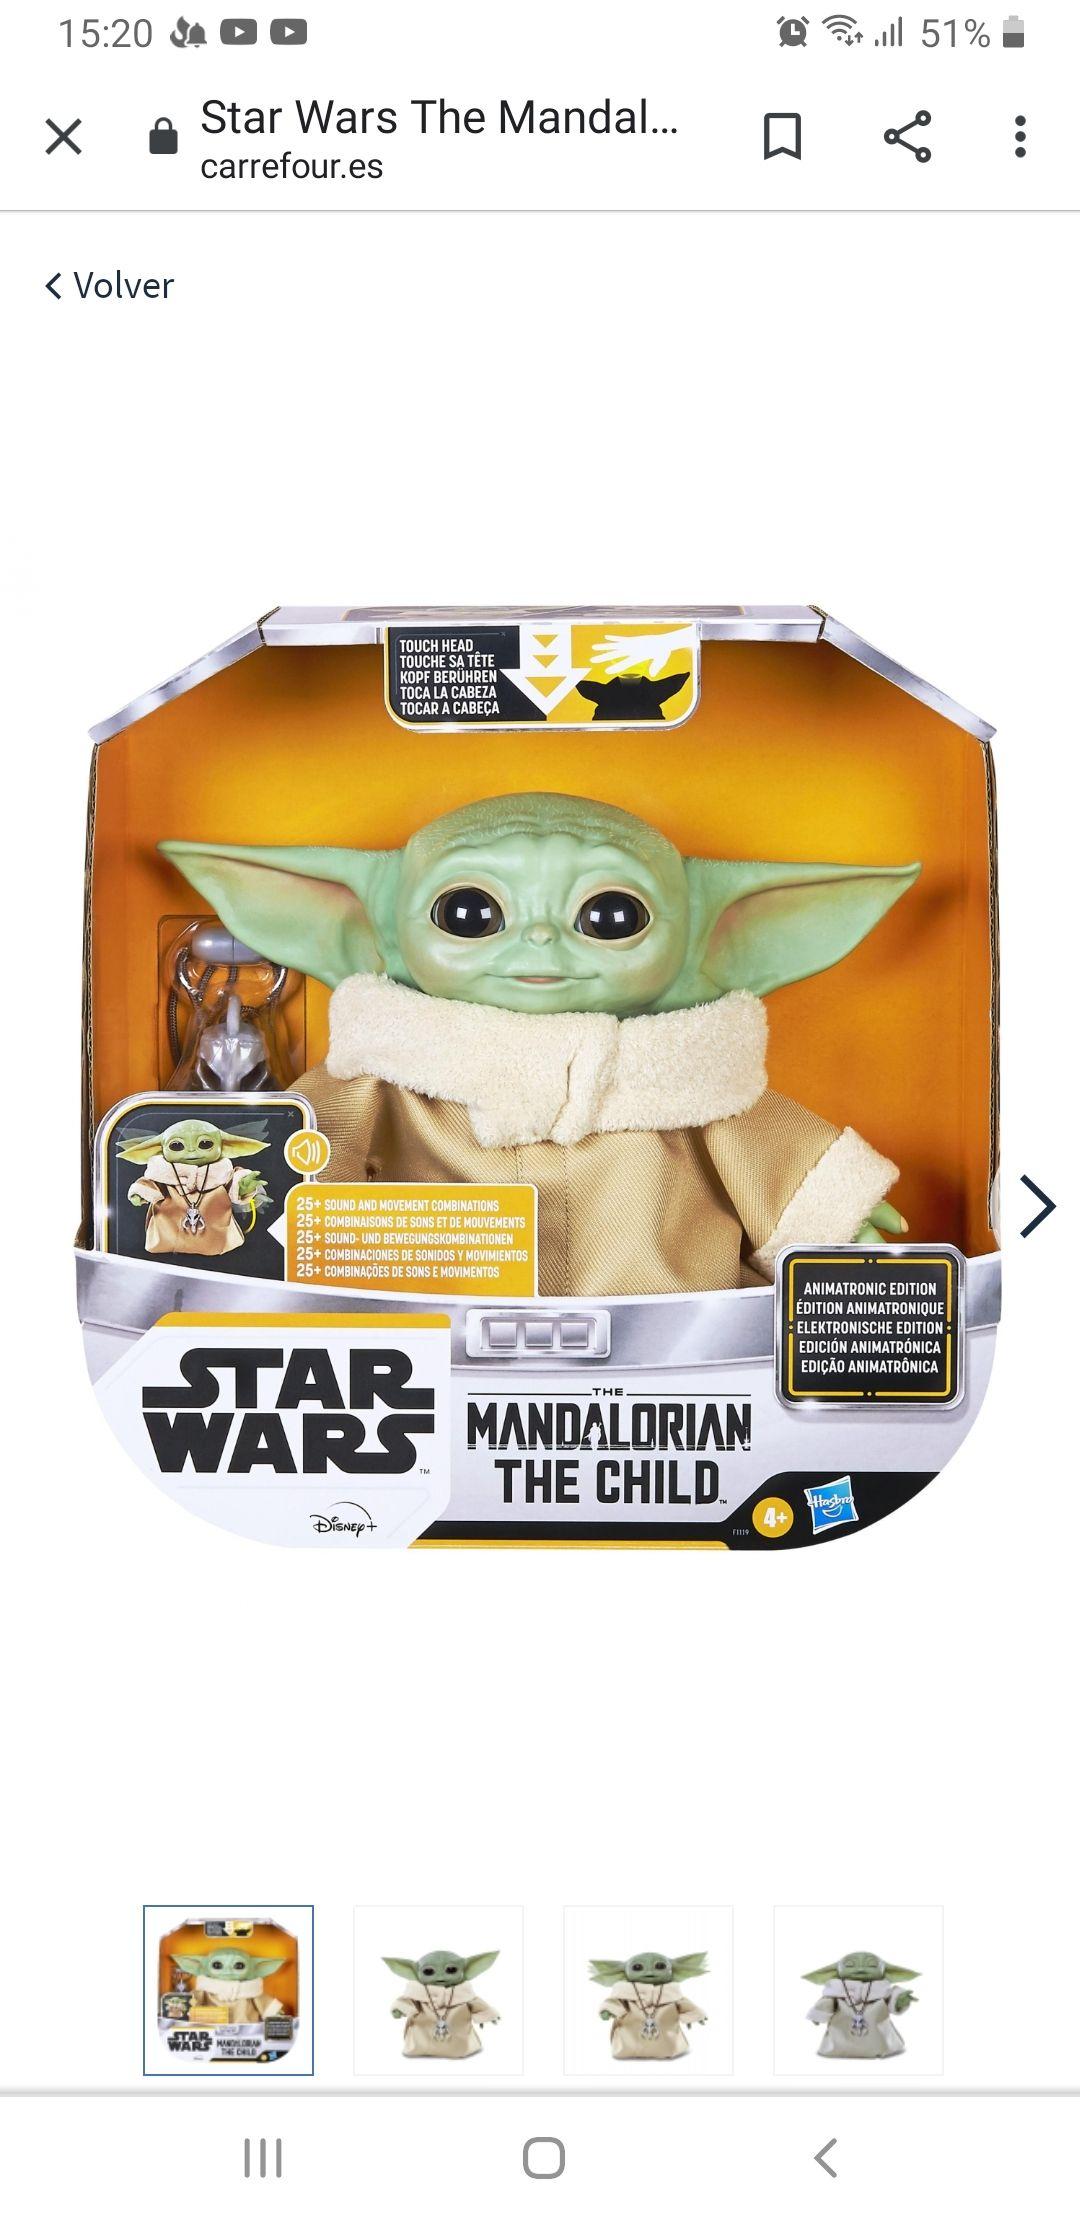 Star Wars The Mandalorian - The Child Animatronic Star Wars